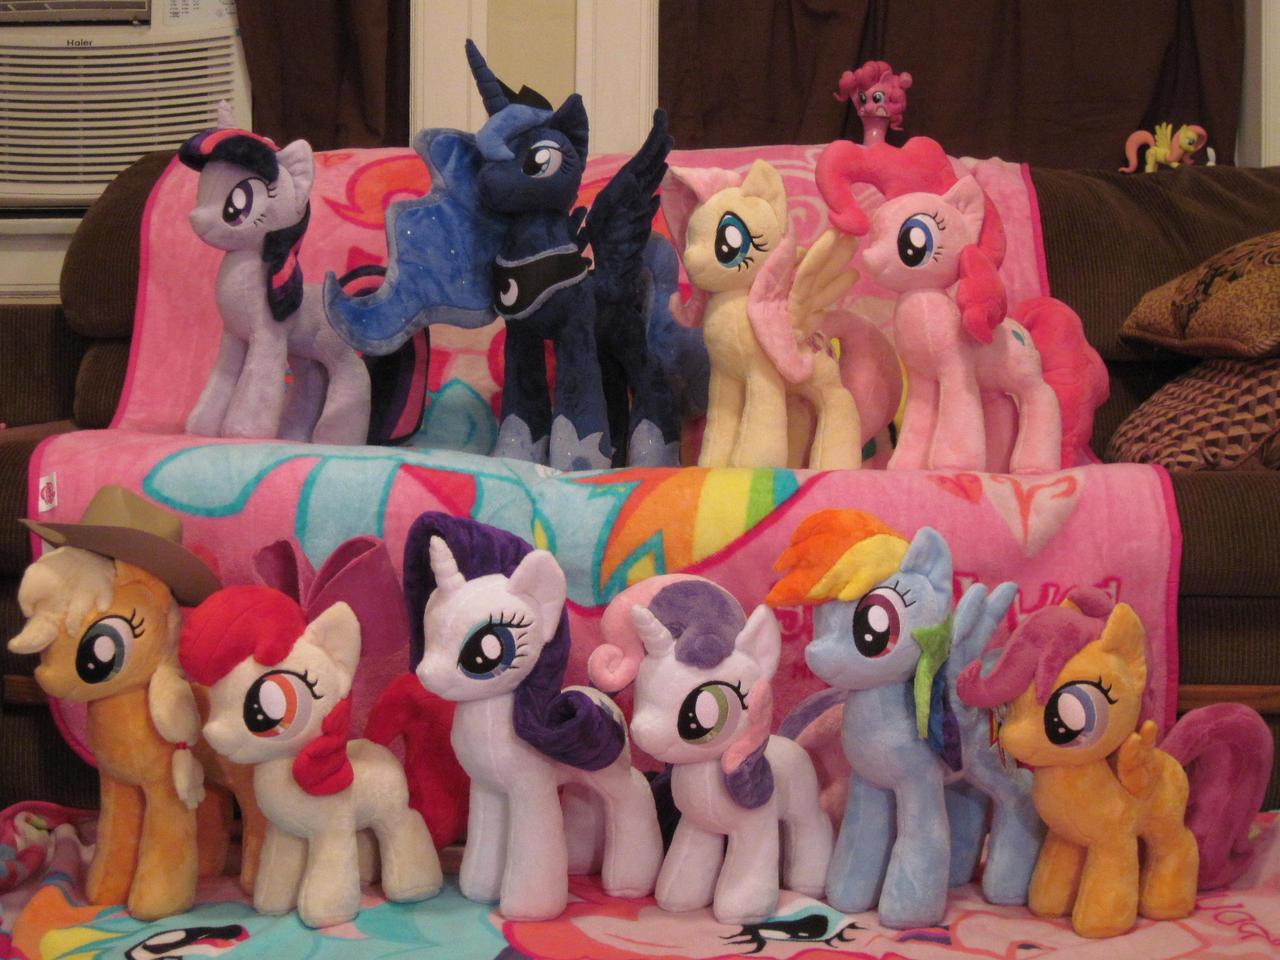 Plushy Ponies by Blackout-Comix